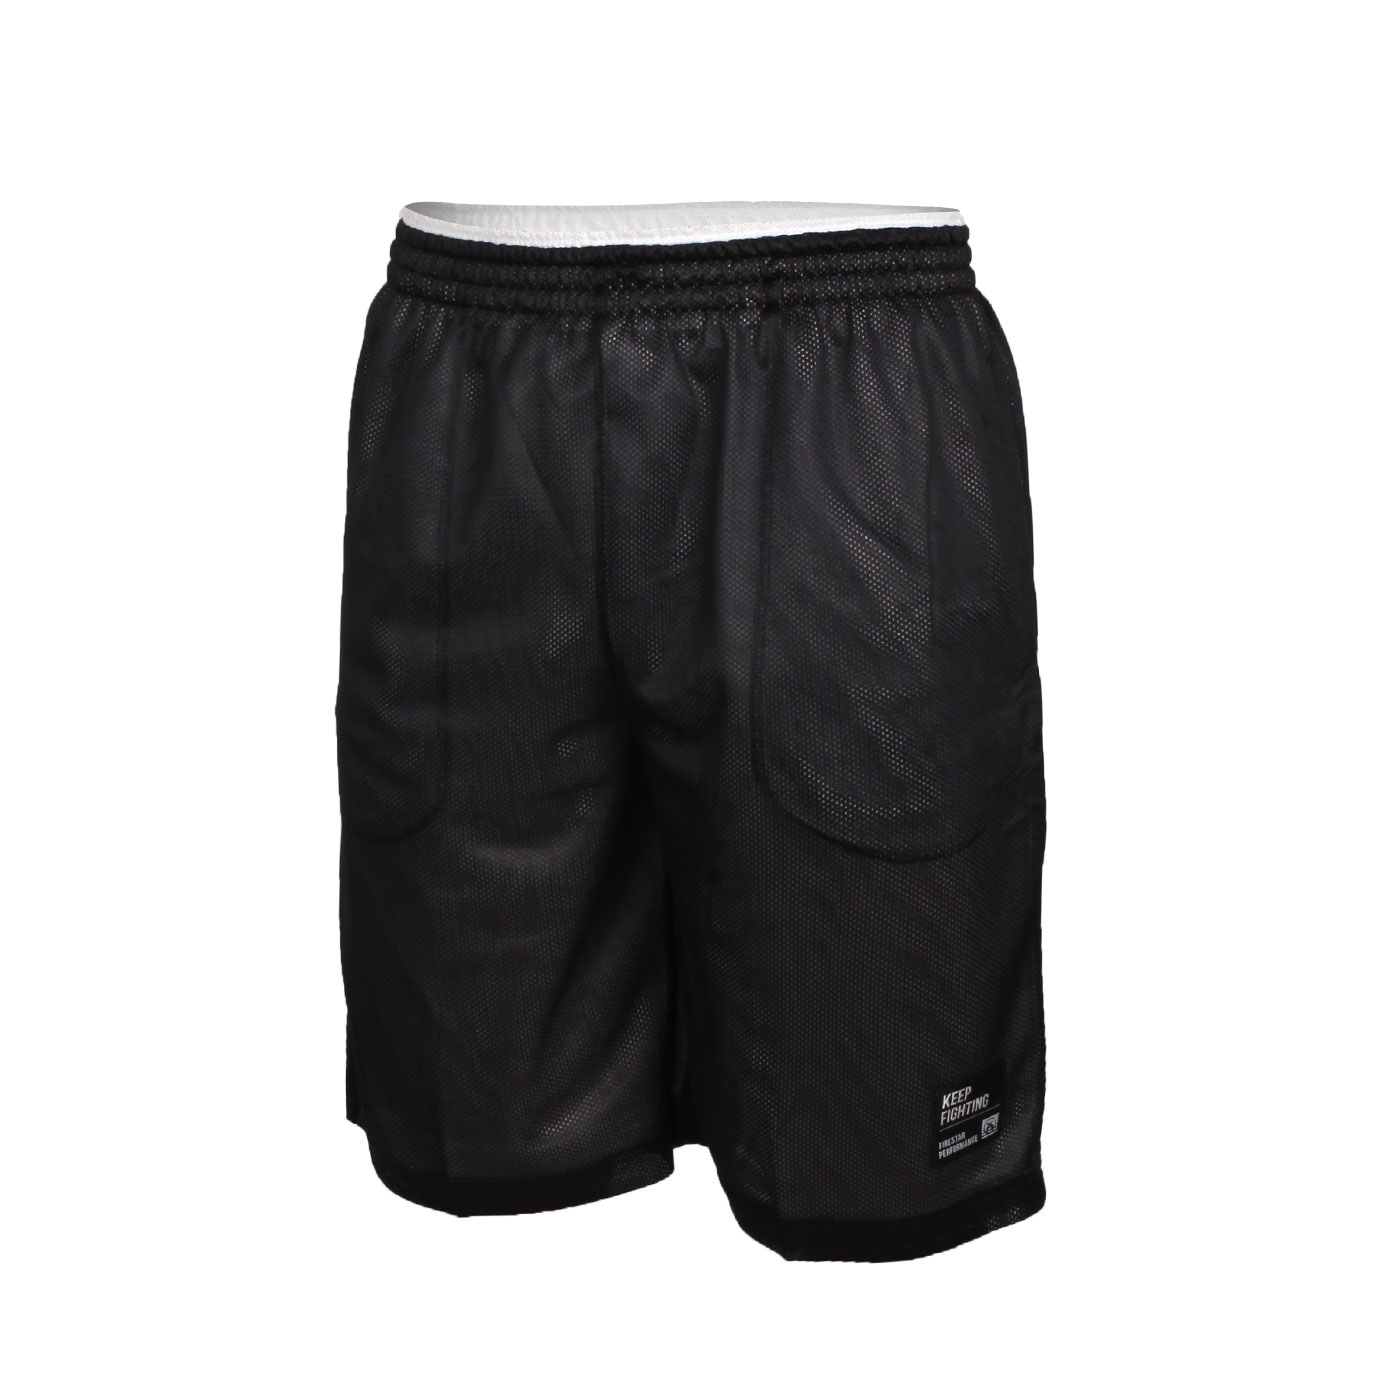 FIRESTAR 男款雙面訓練籃球短褲 B1706-15 - 黑白